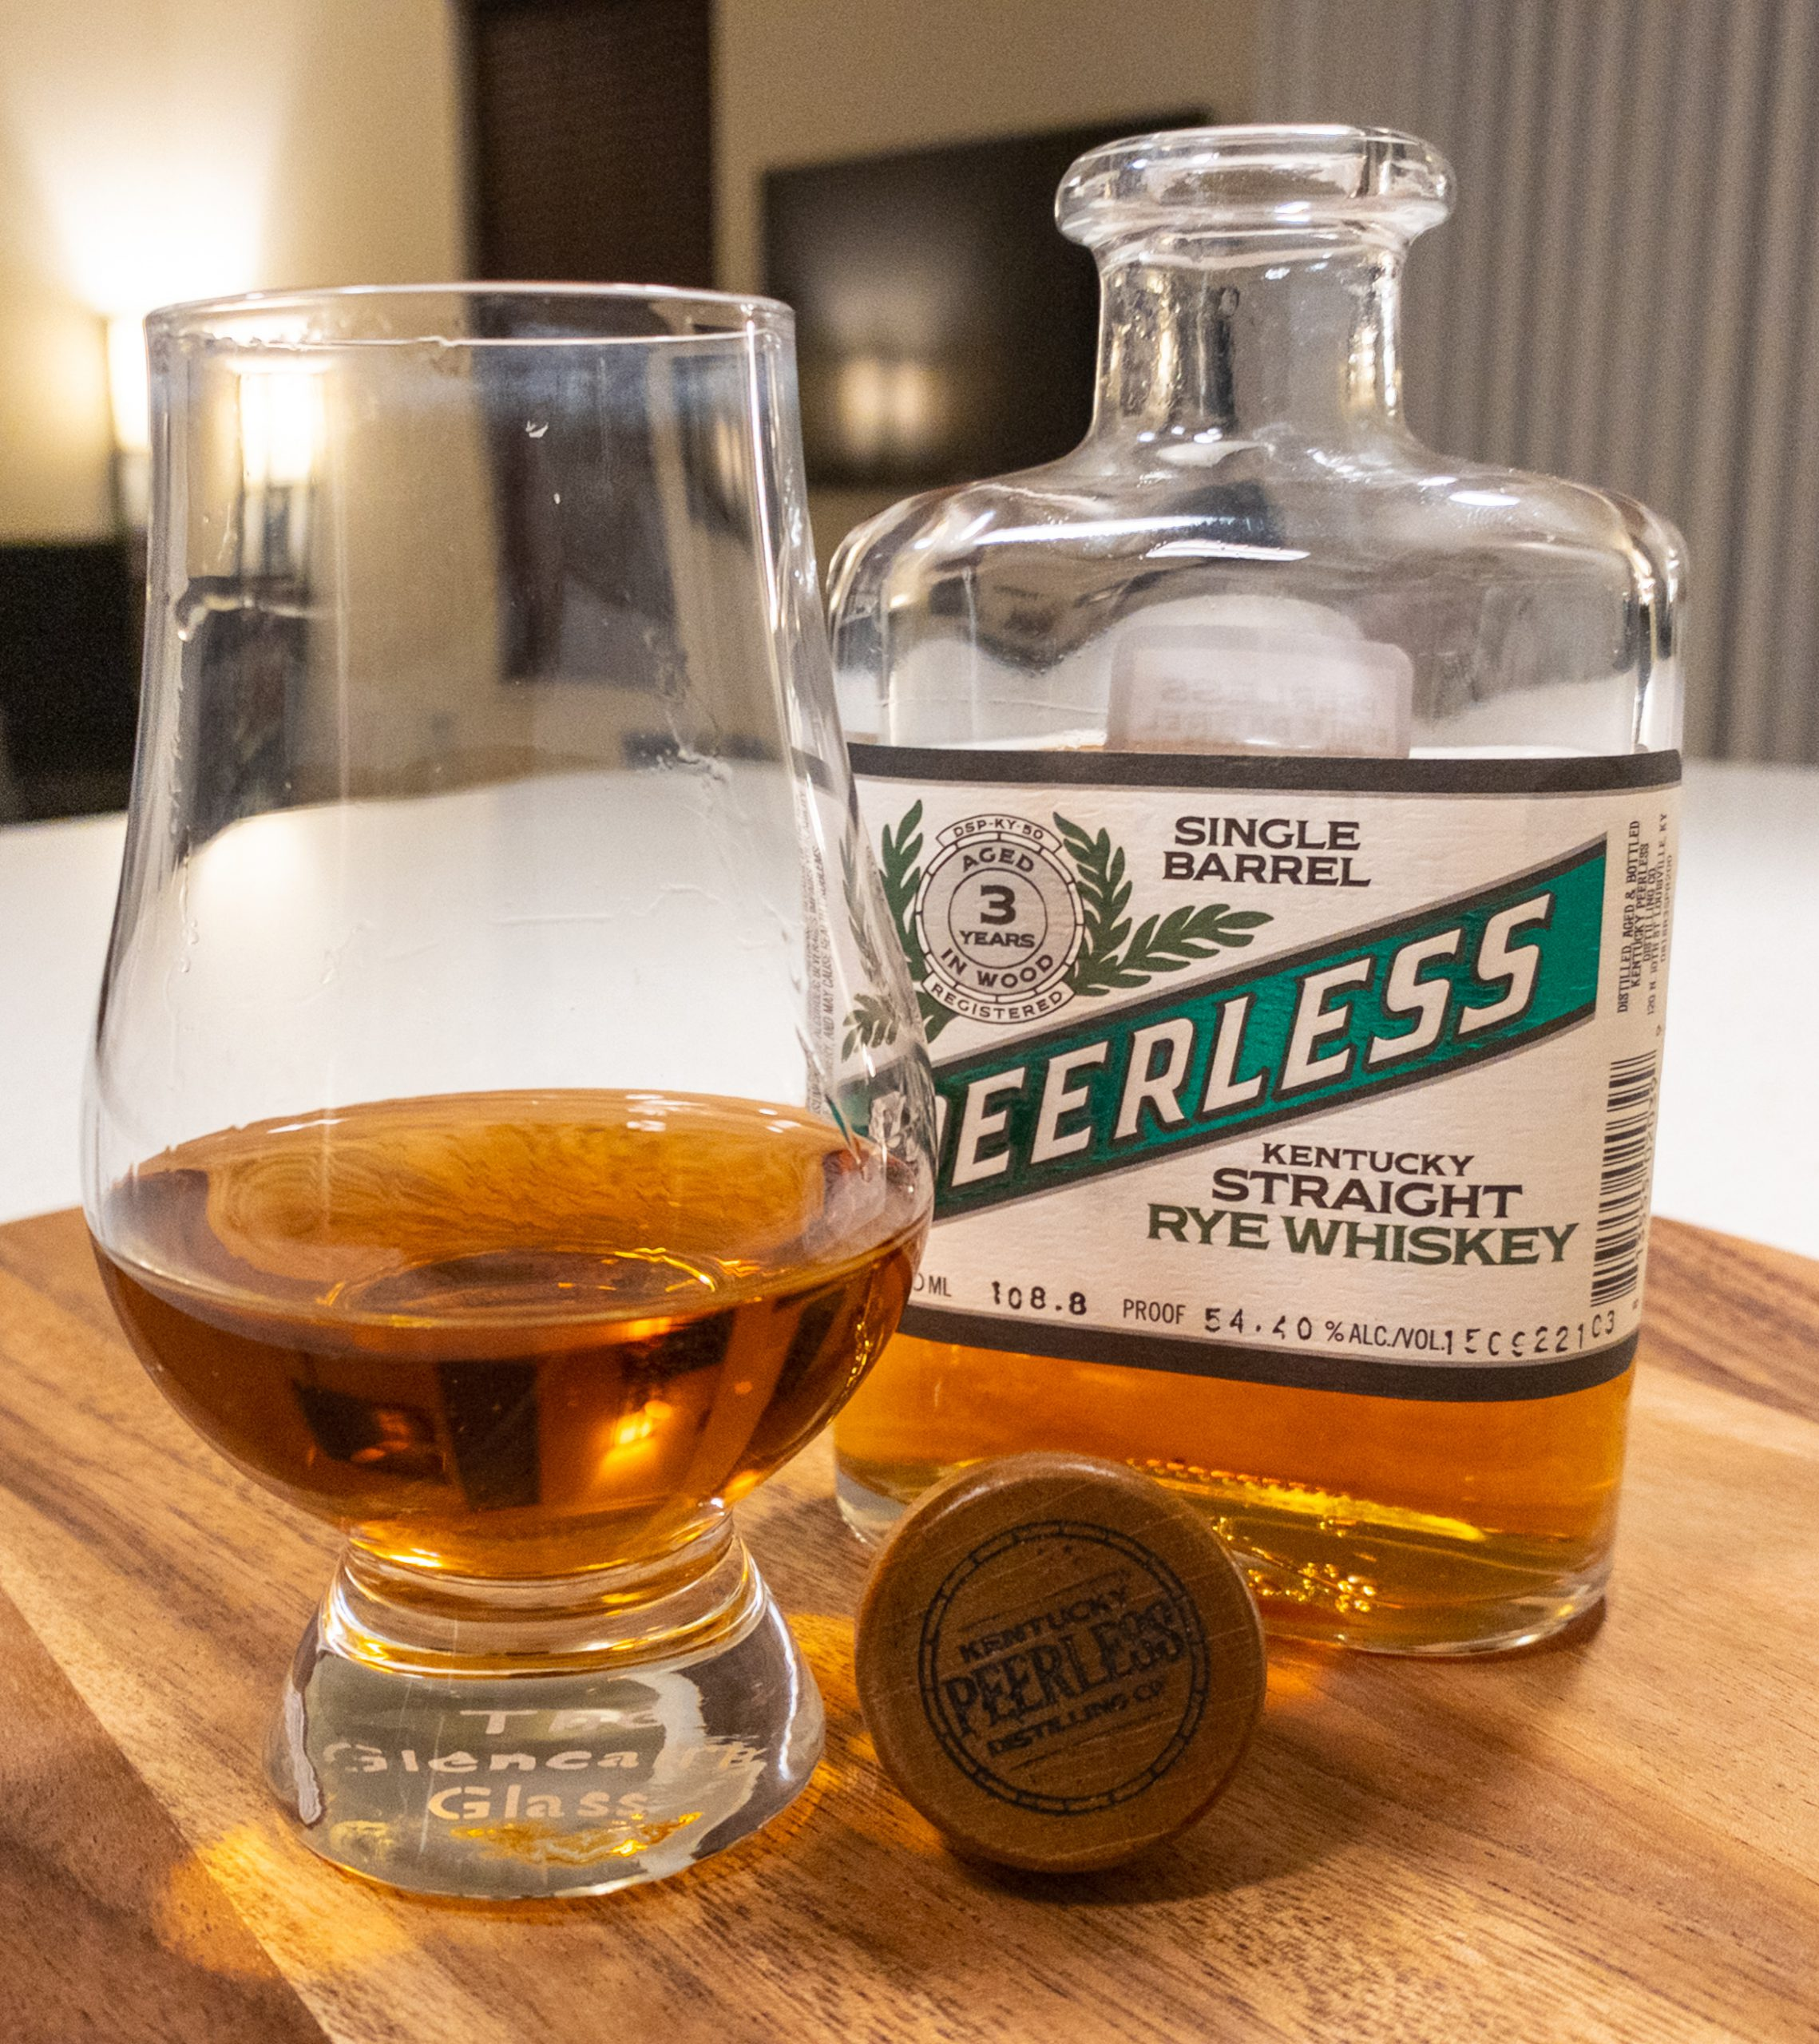 Peerless Single Barrel Rye